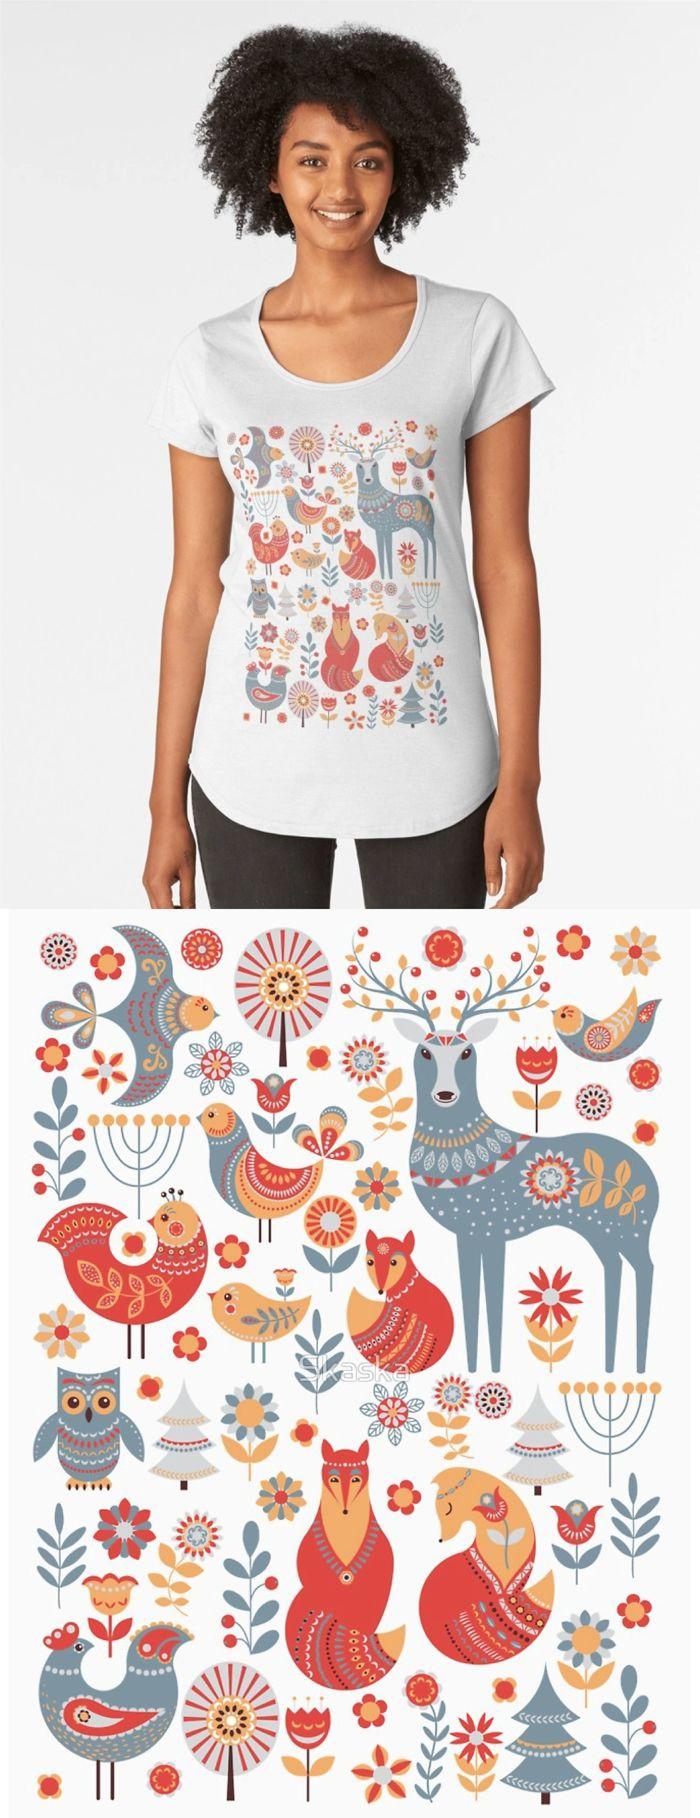 Cute animals and birds in a fairy forest. Deer, owl, foxes, birds, flowers, spruce. Scandinavian style. Folk art.